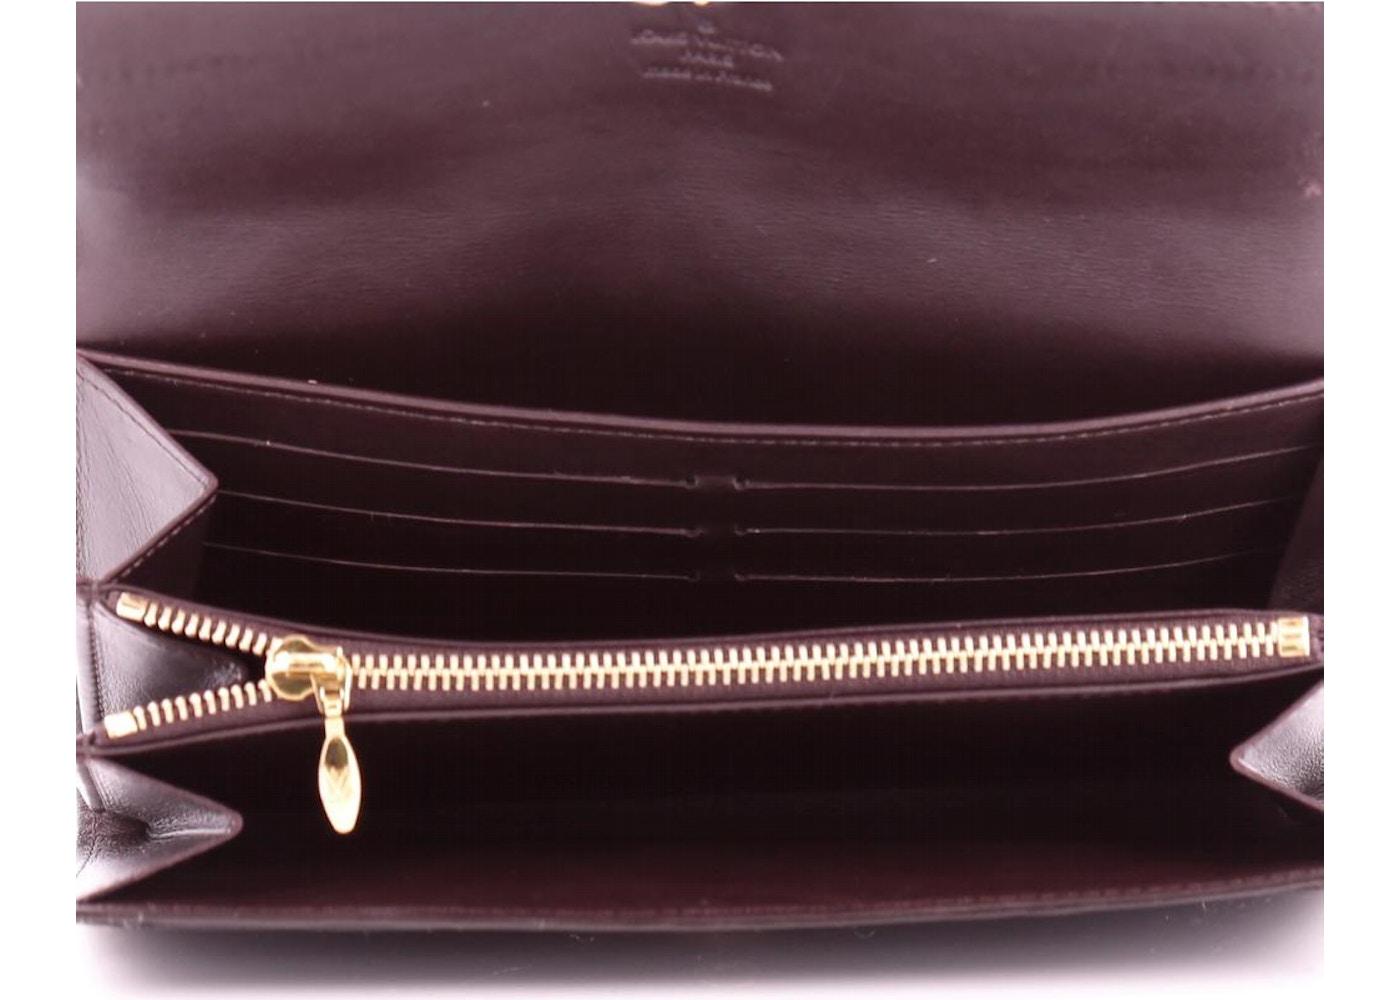 4d1ea1e7bf48 Louis Vuitton Wallet Sarah Monogram Vernis Amarante